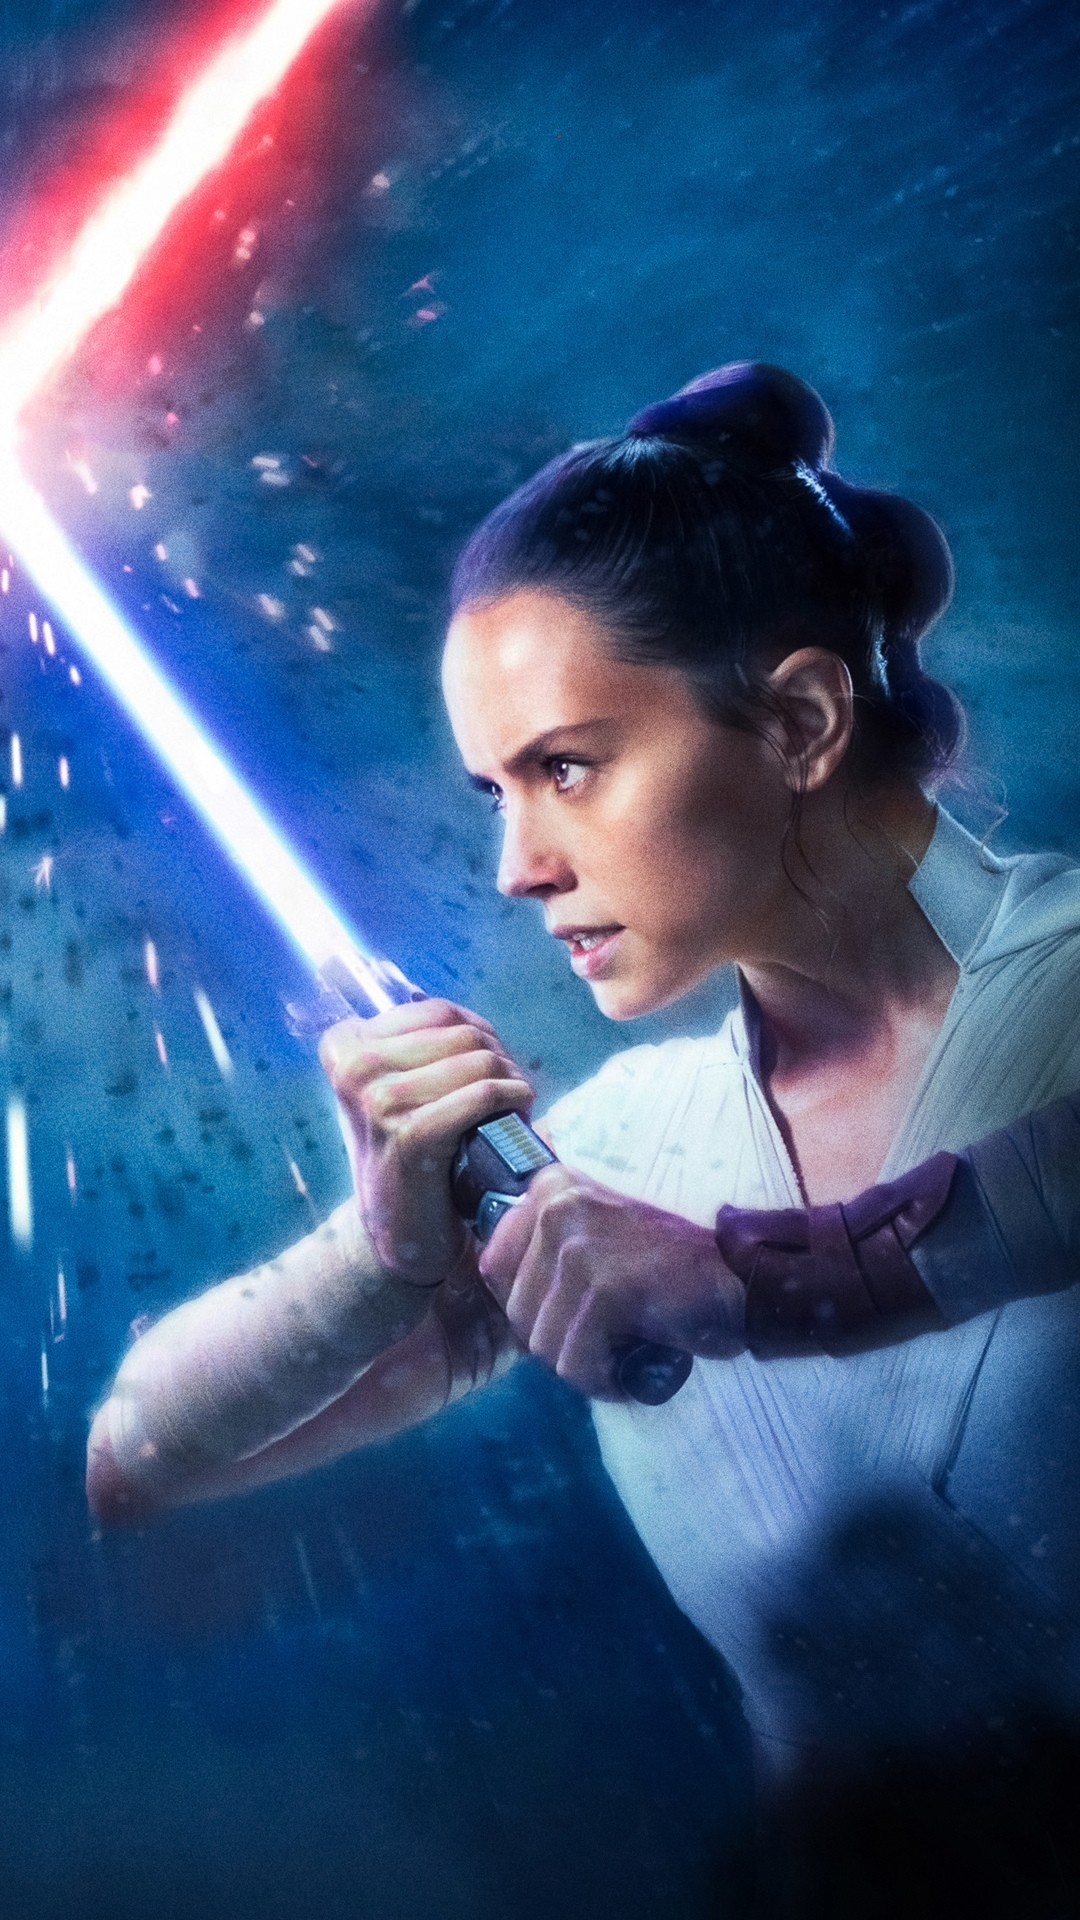 Star Wars The Rise Of Skywalker lock screen wallpaper